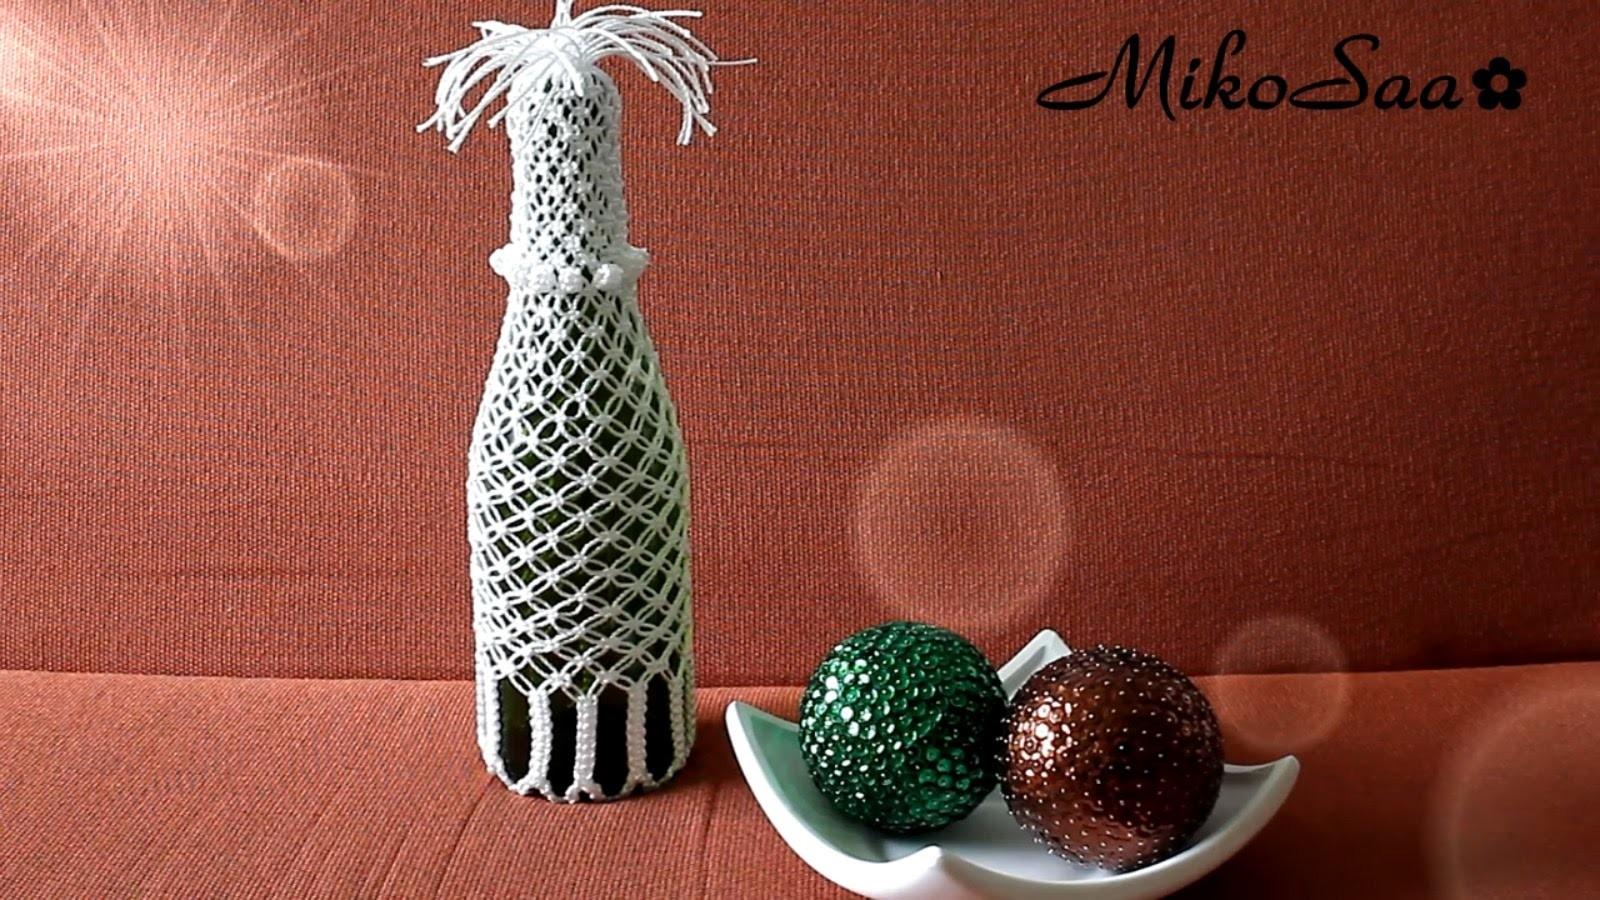 DIY Botella Reciclada con Macrame. DIY Recycled Bottle with Macrame - MikoSaa